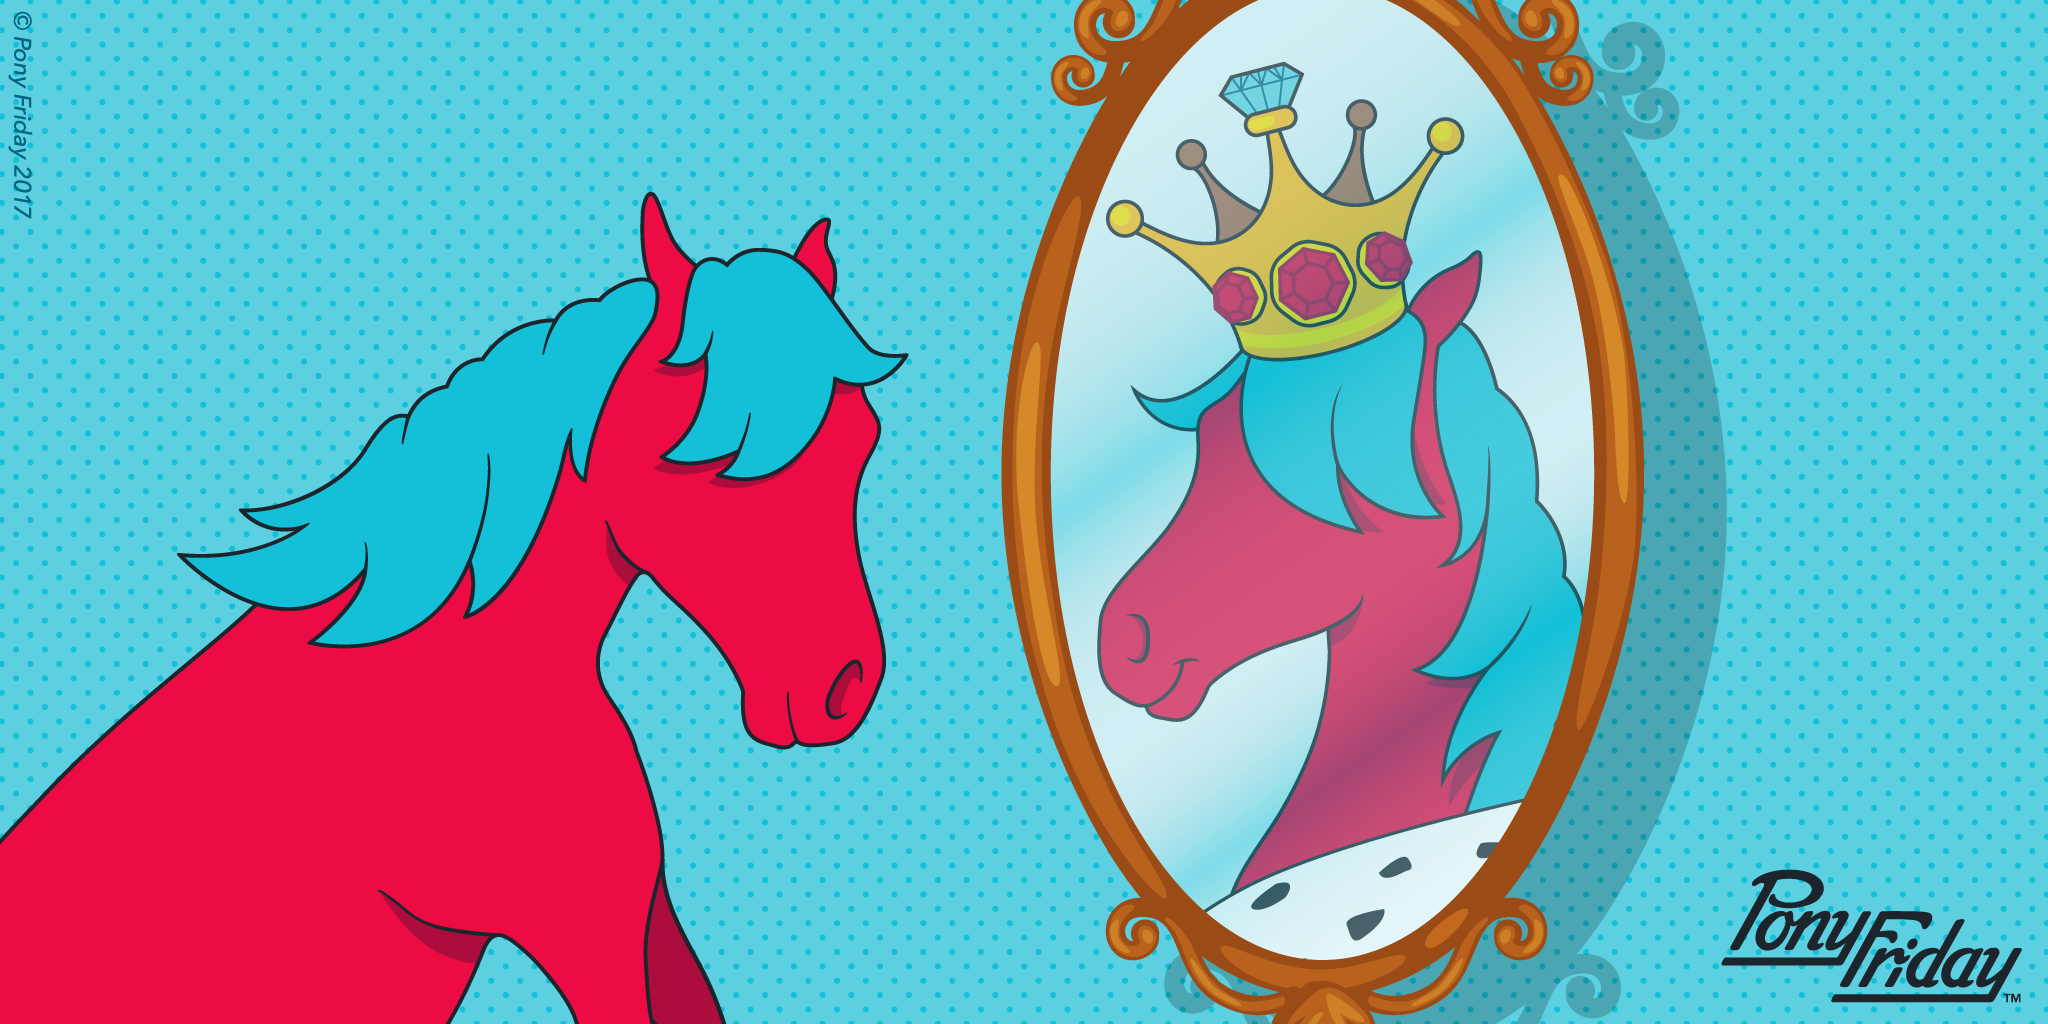 Pony-Friday-Mirror-Mirror-King-Royalty-Fraud-Imposter-Horse-Reflection-Blog-Post-Header-Image.png